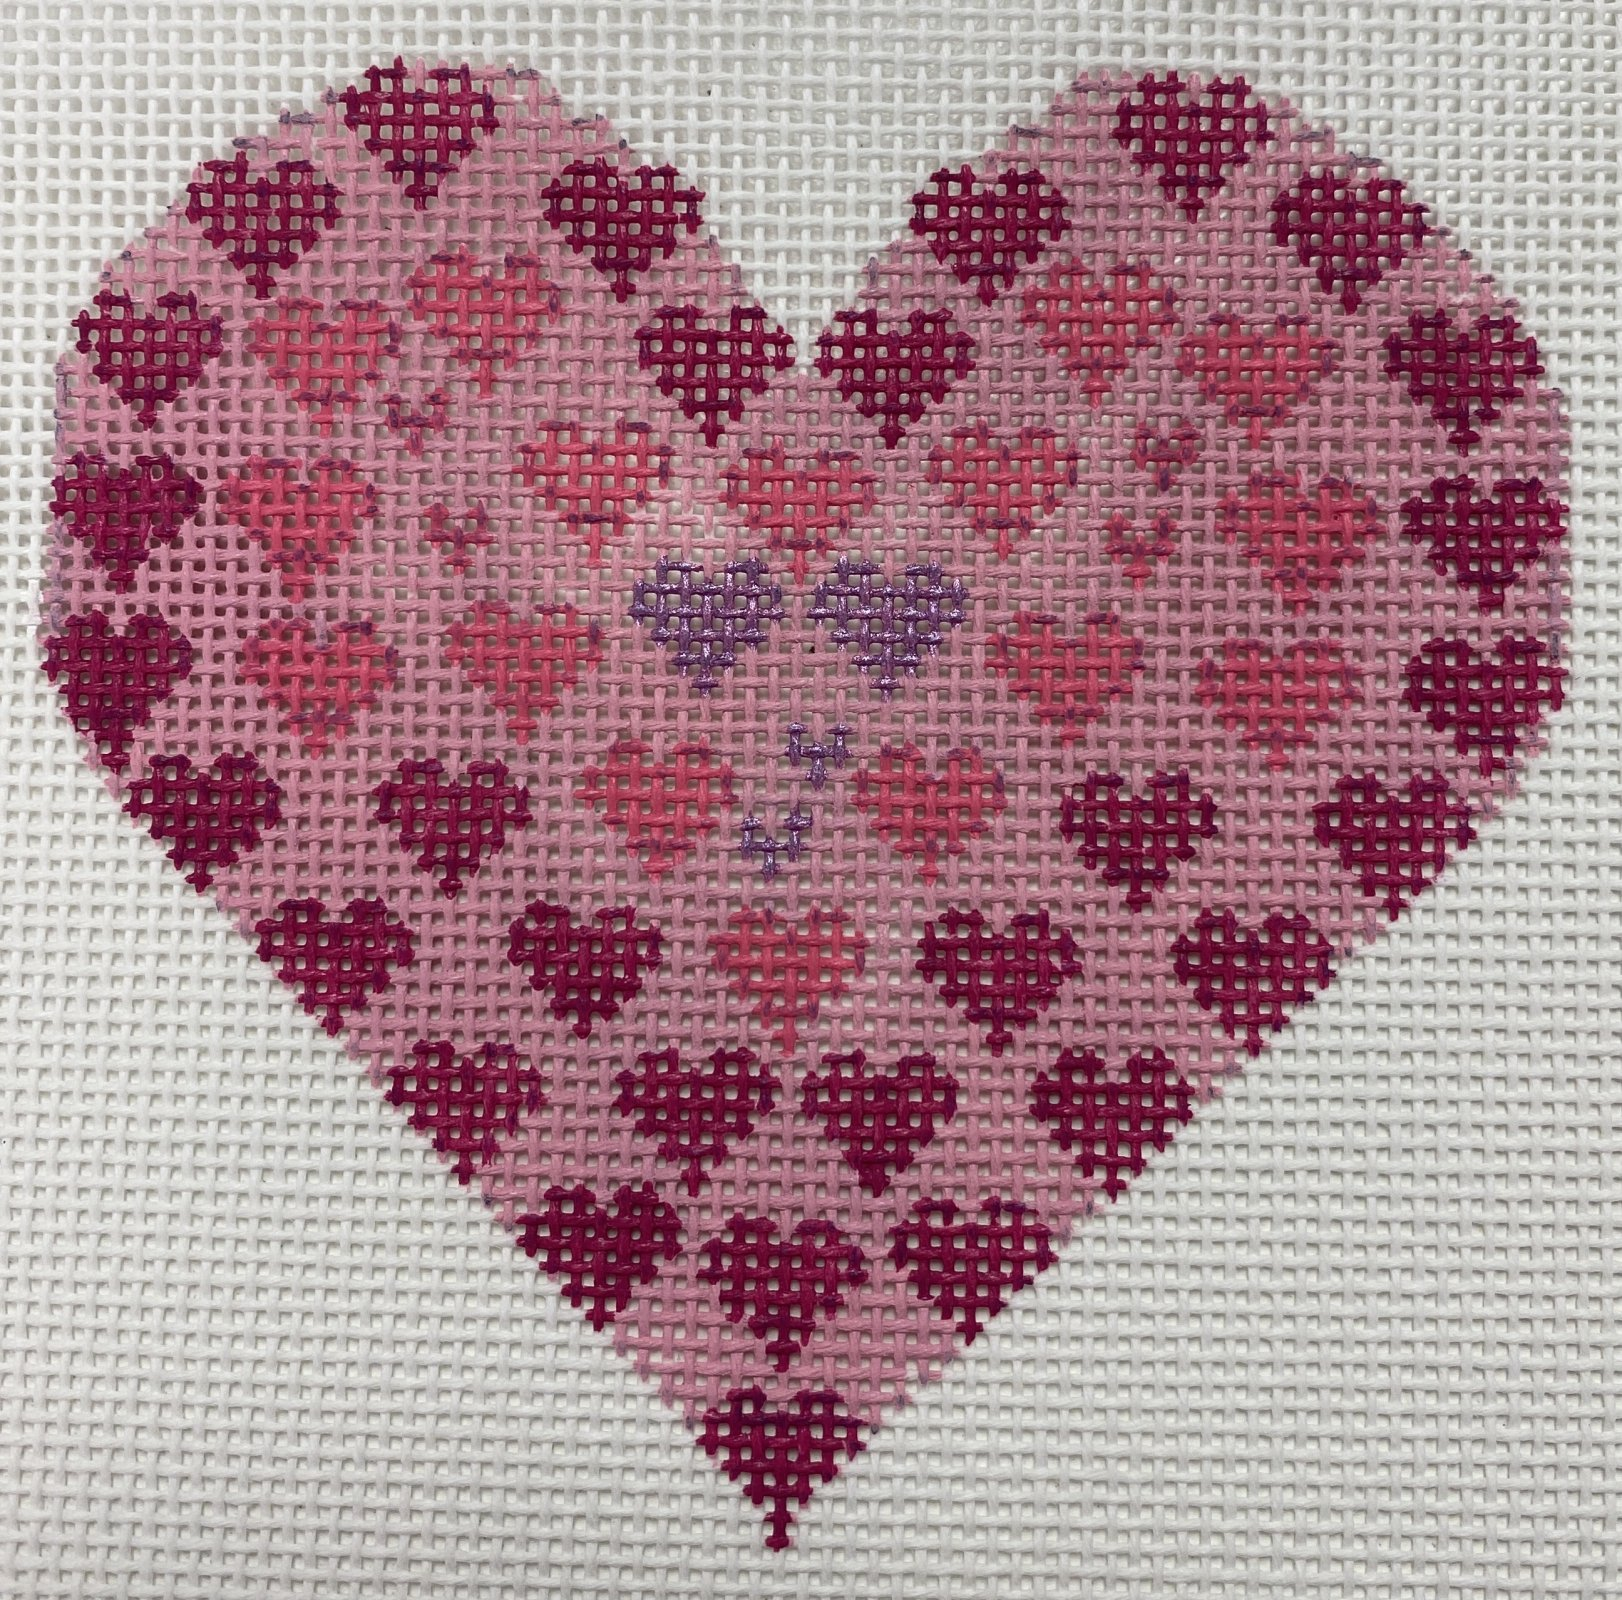 Small Hearts,18 ct.,3.5